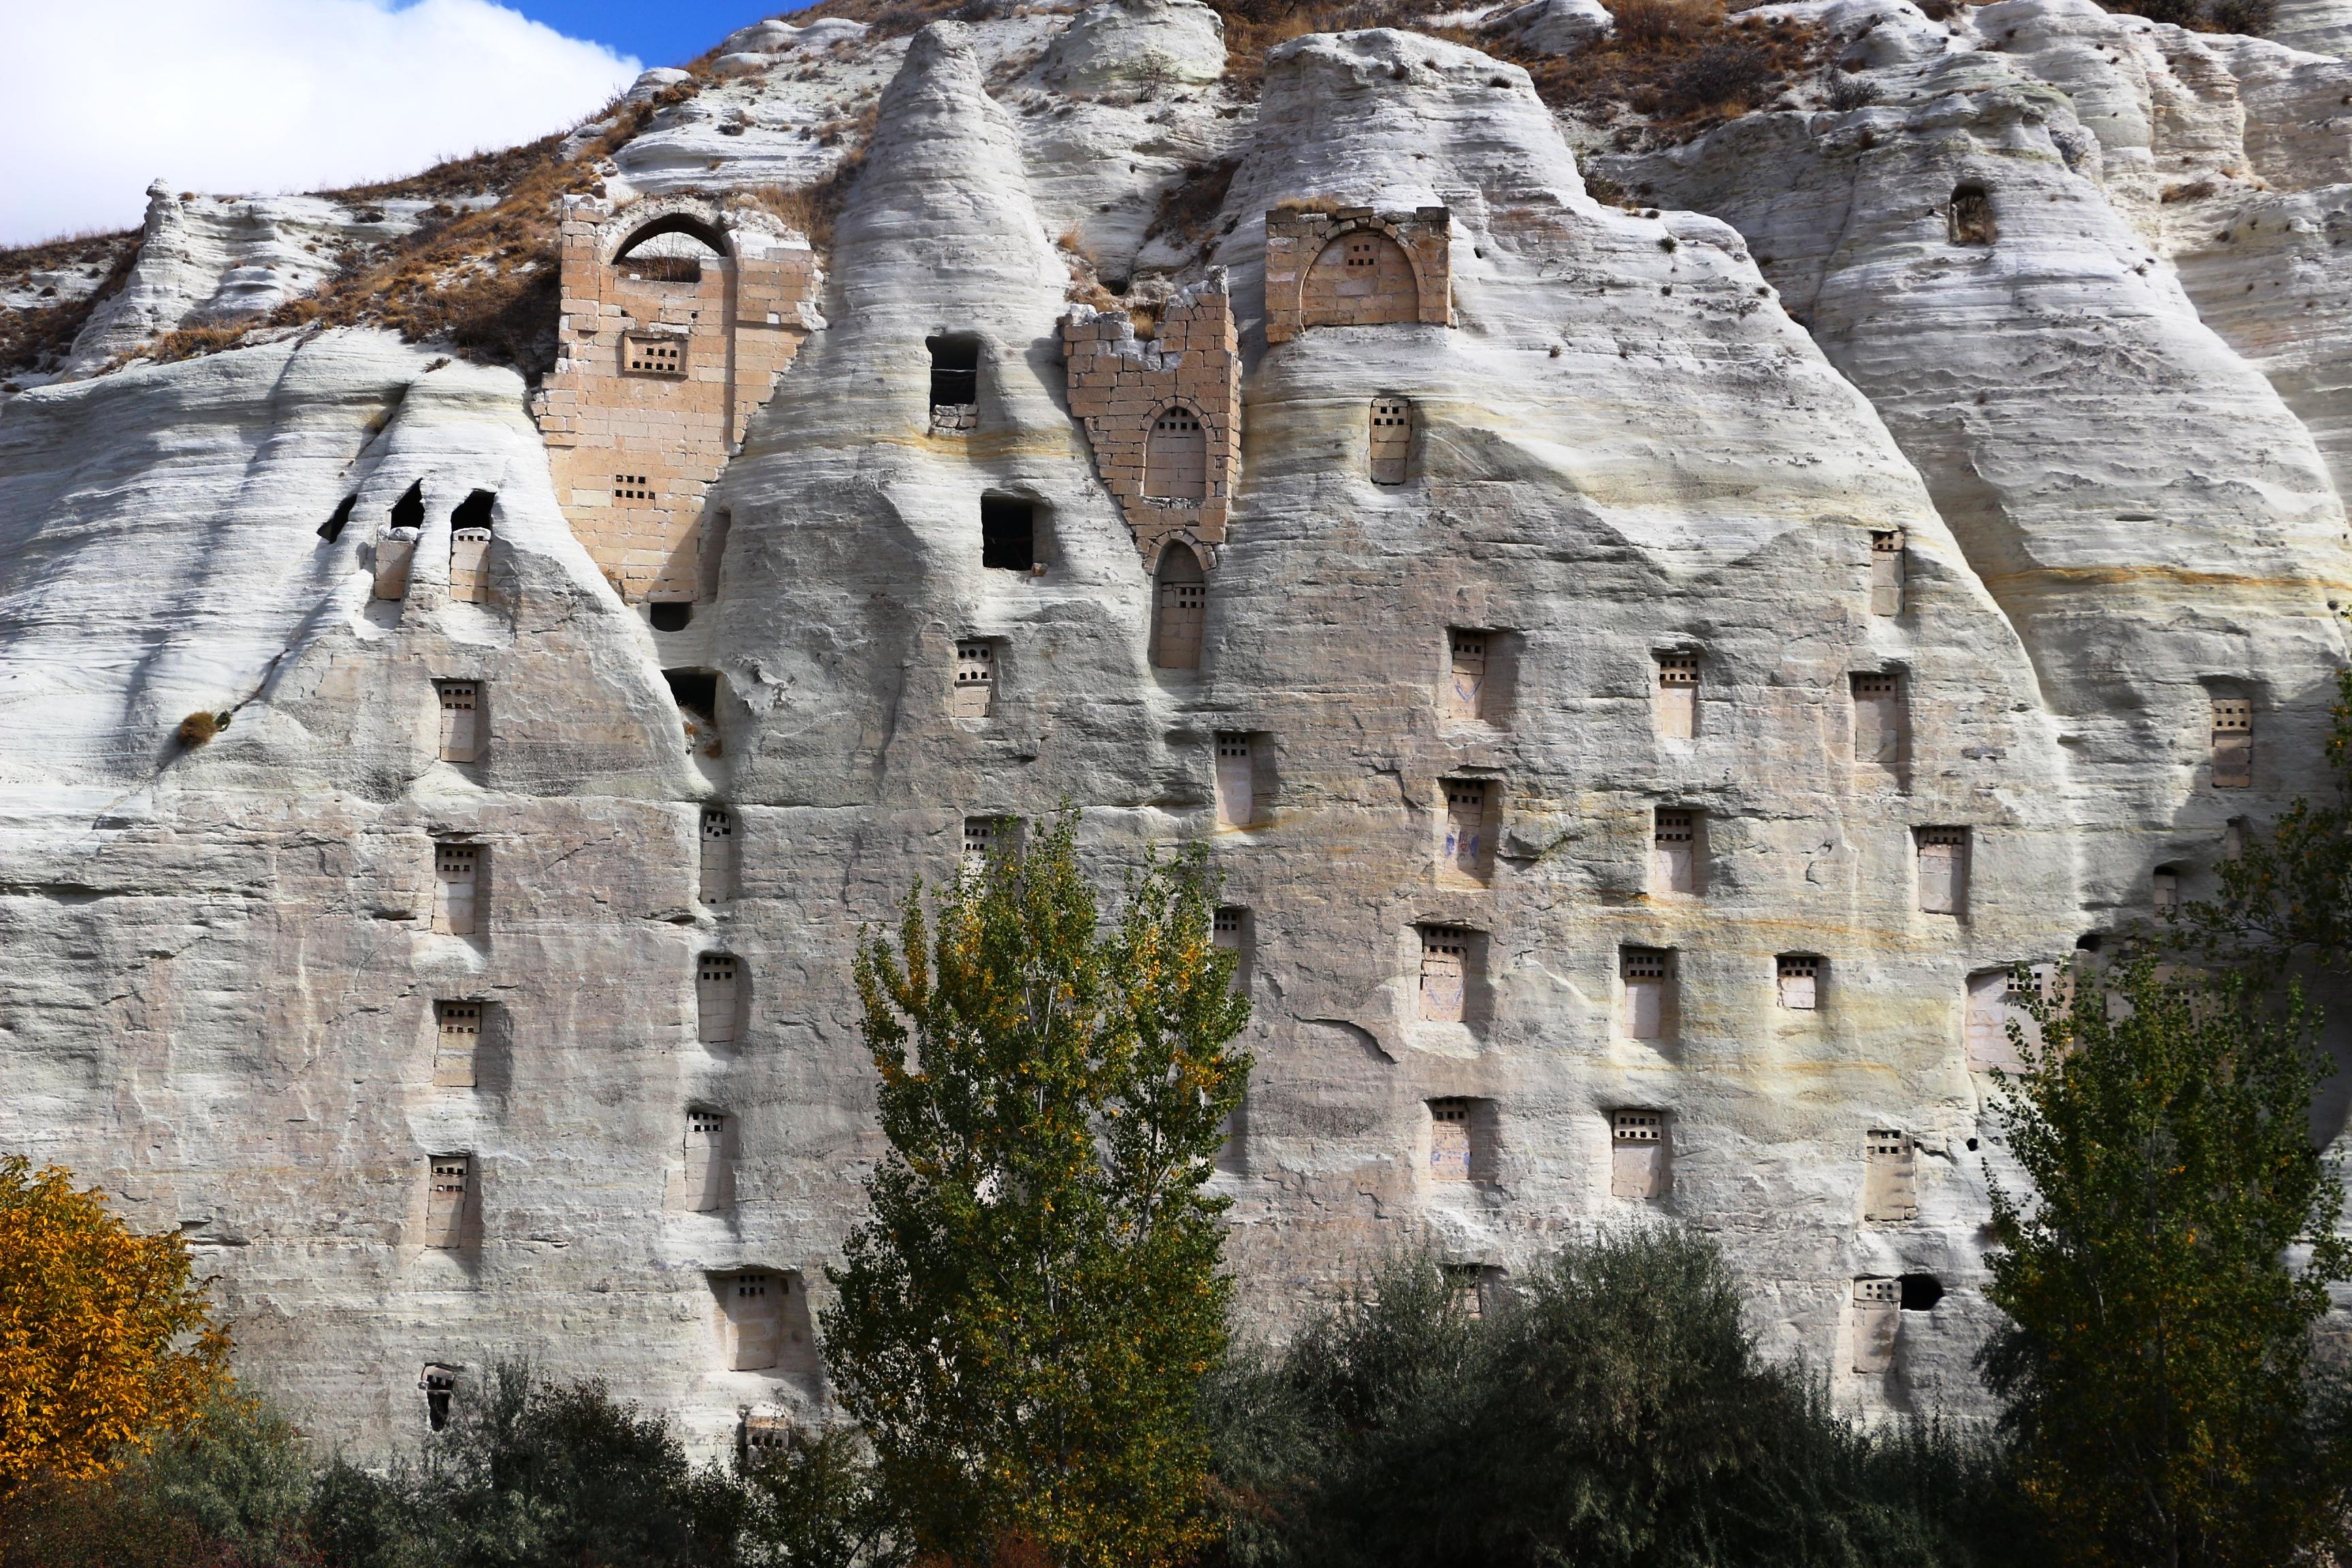 randonnee en cappadoce pigeonnier godema